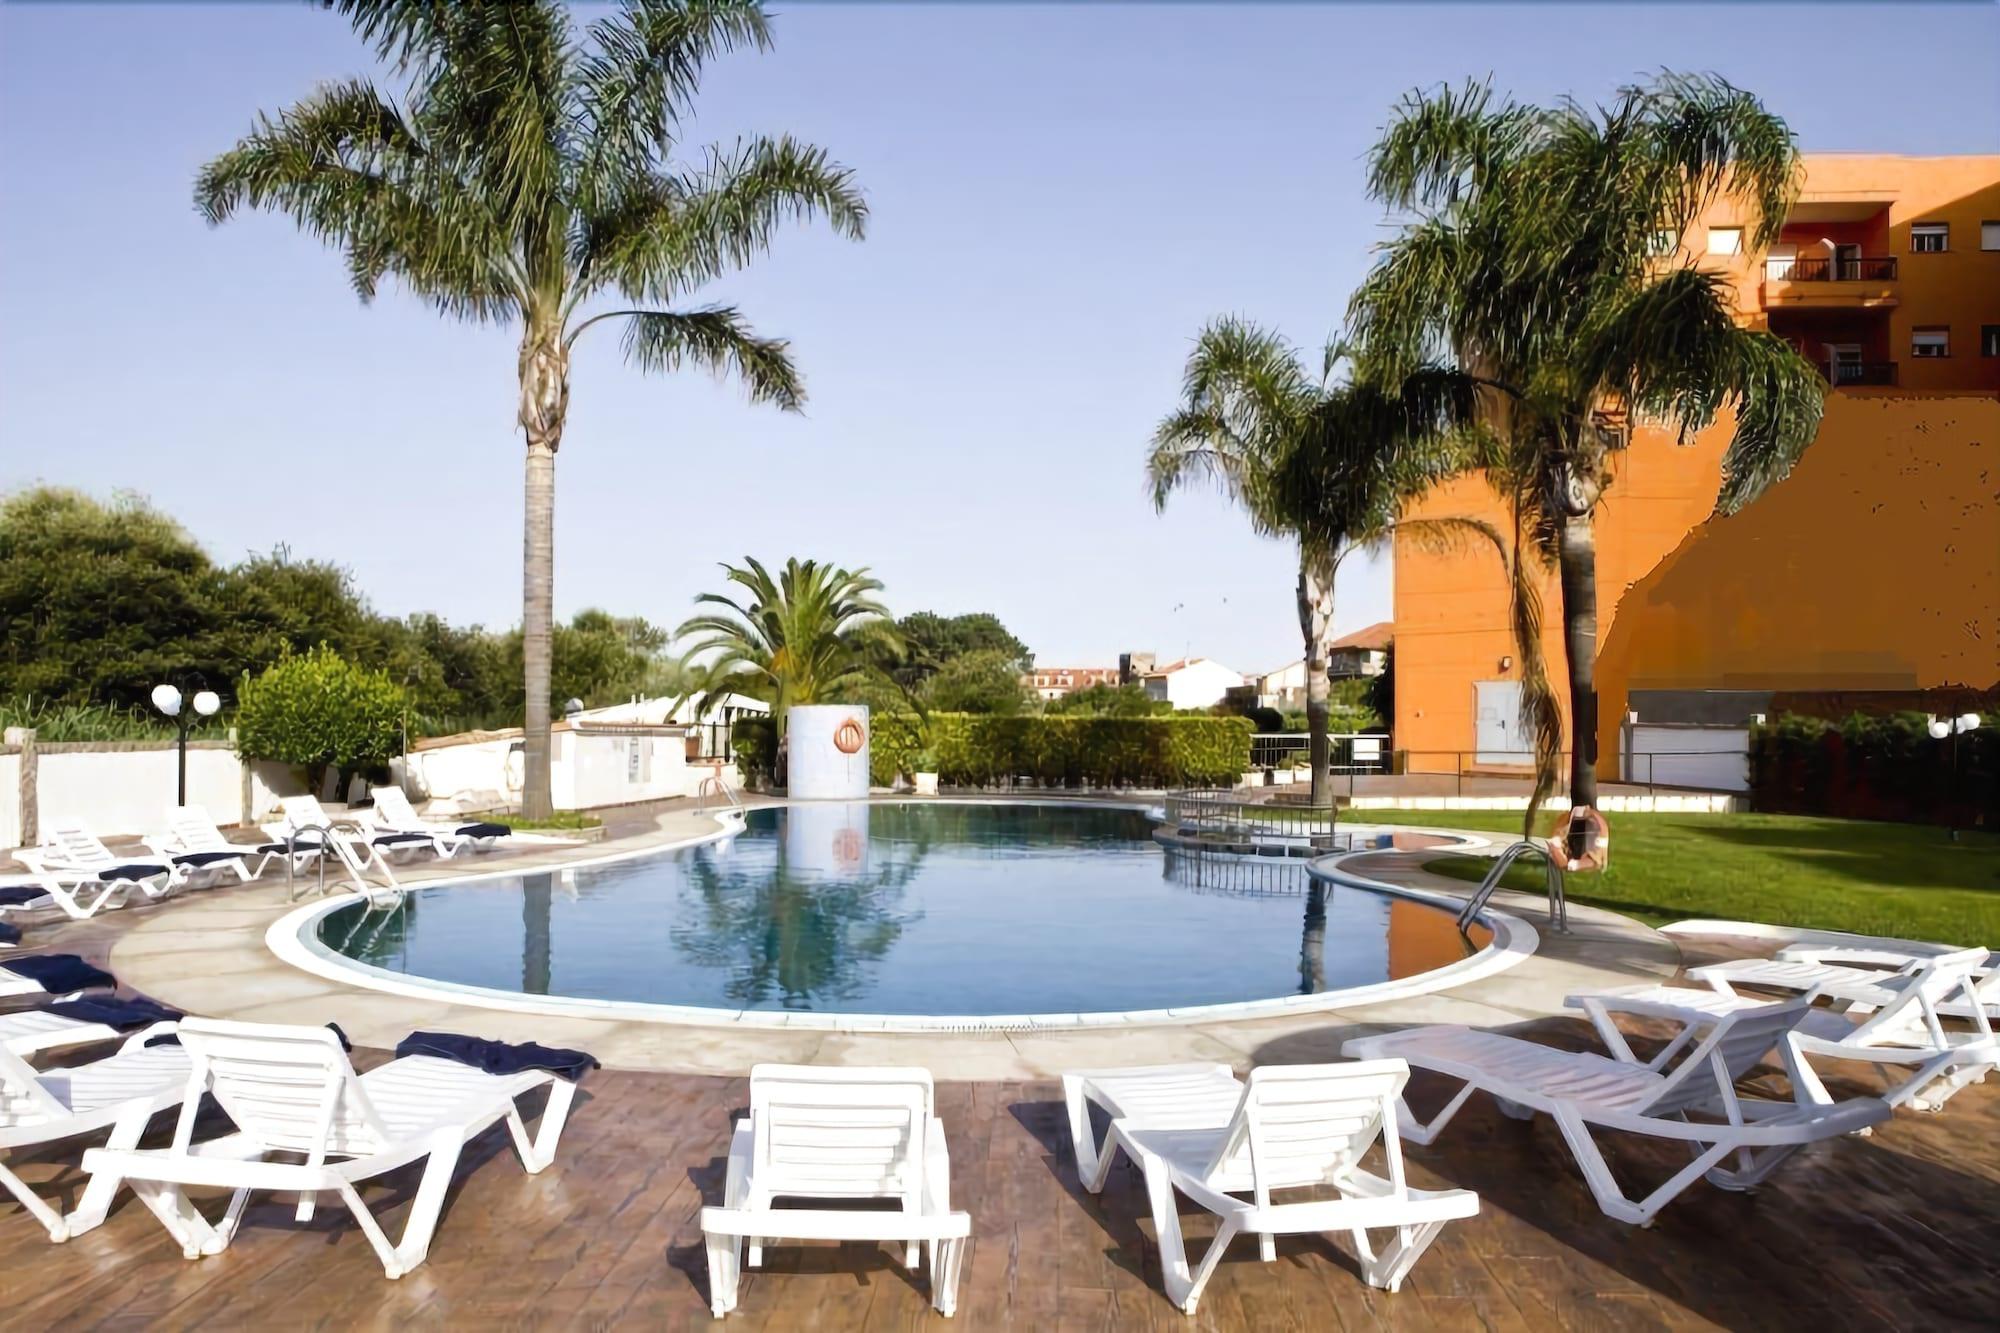 los-naranjos-hotel-sanxenxo 4848